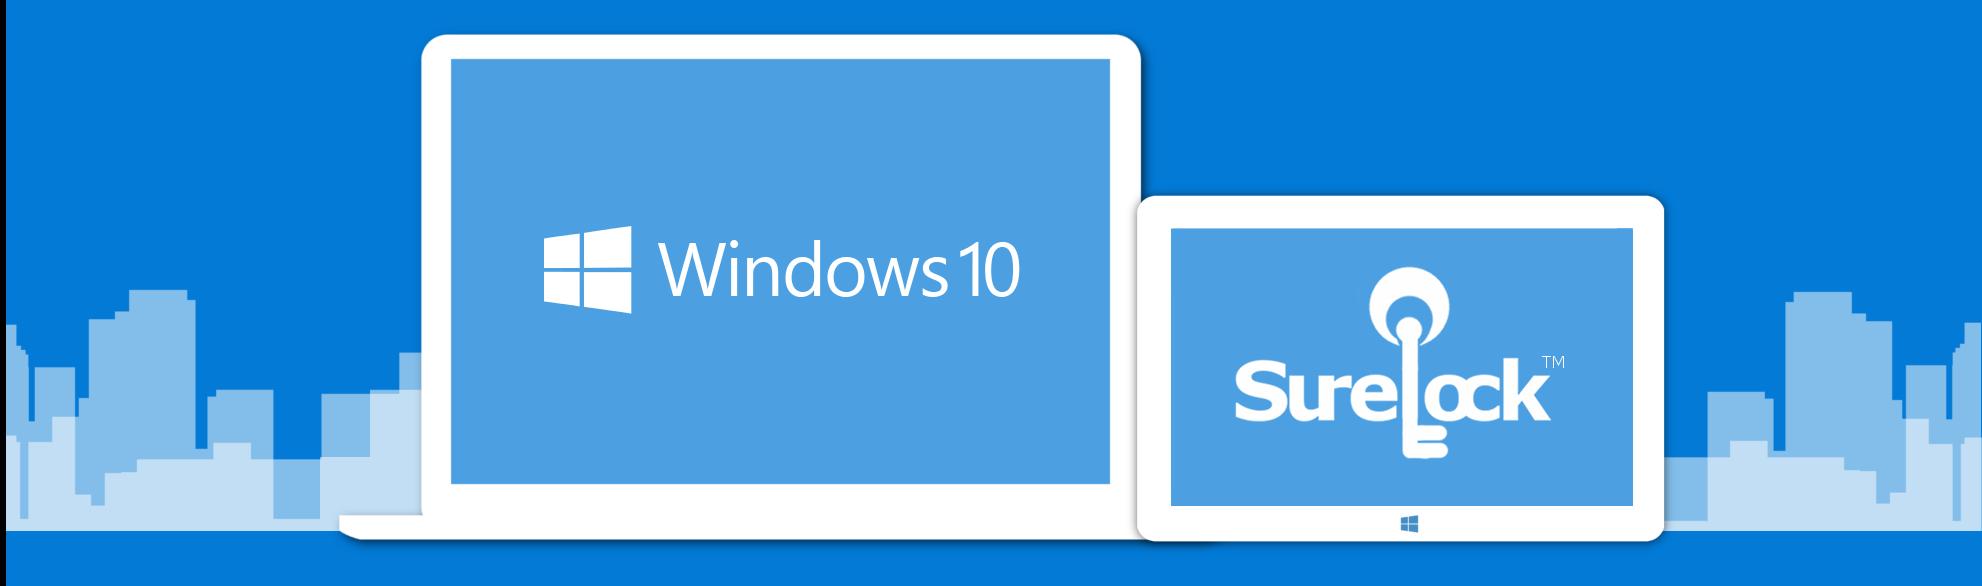 windows10-surelock